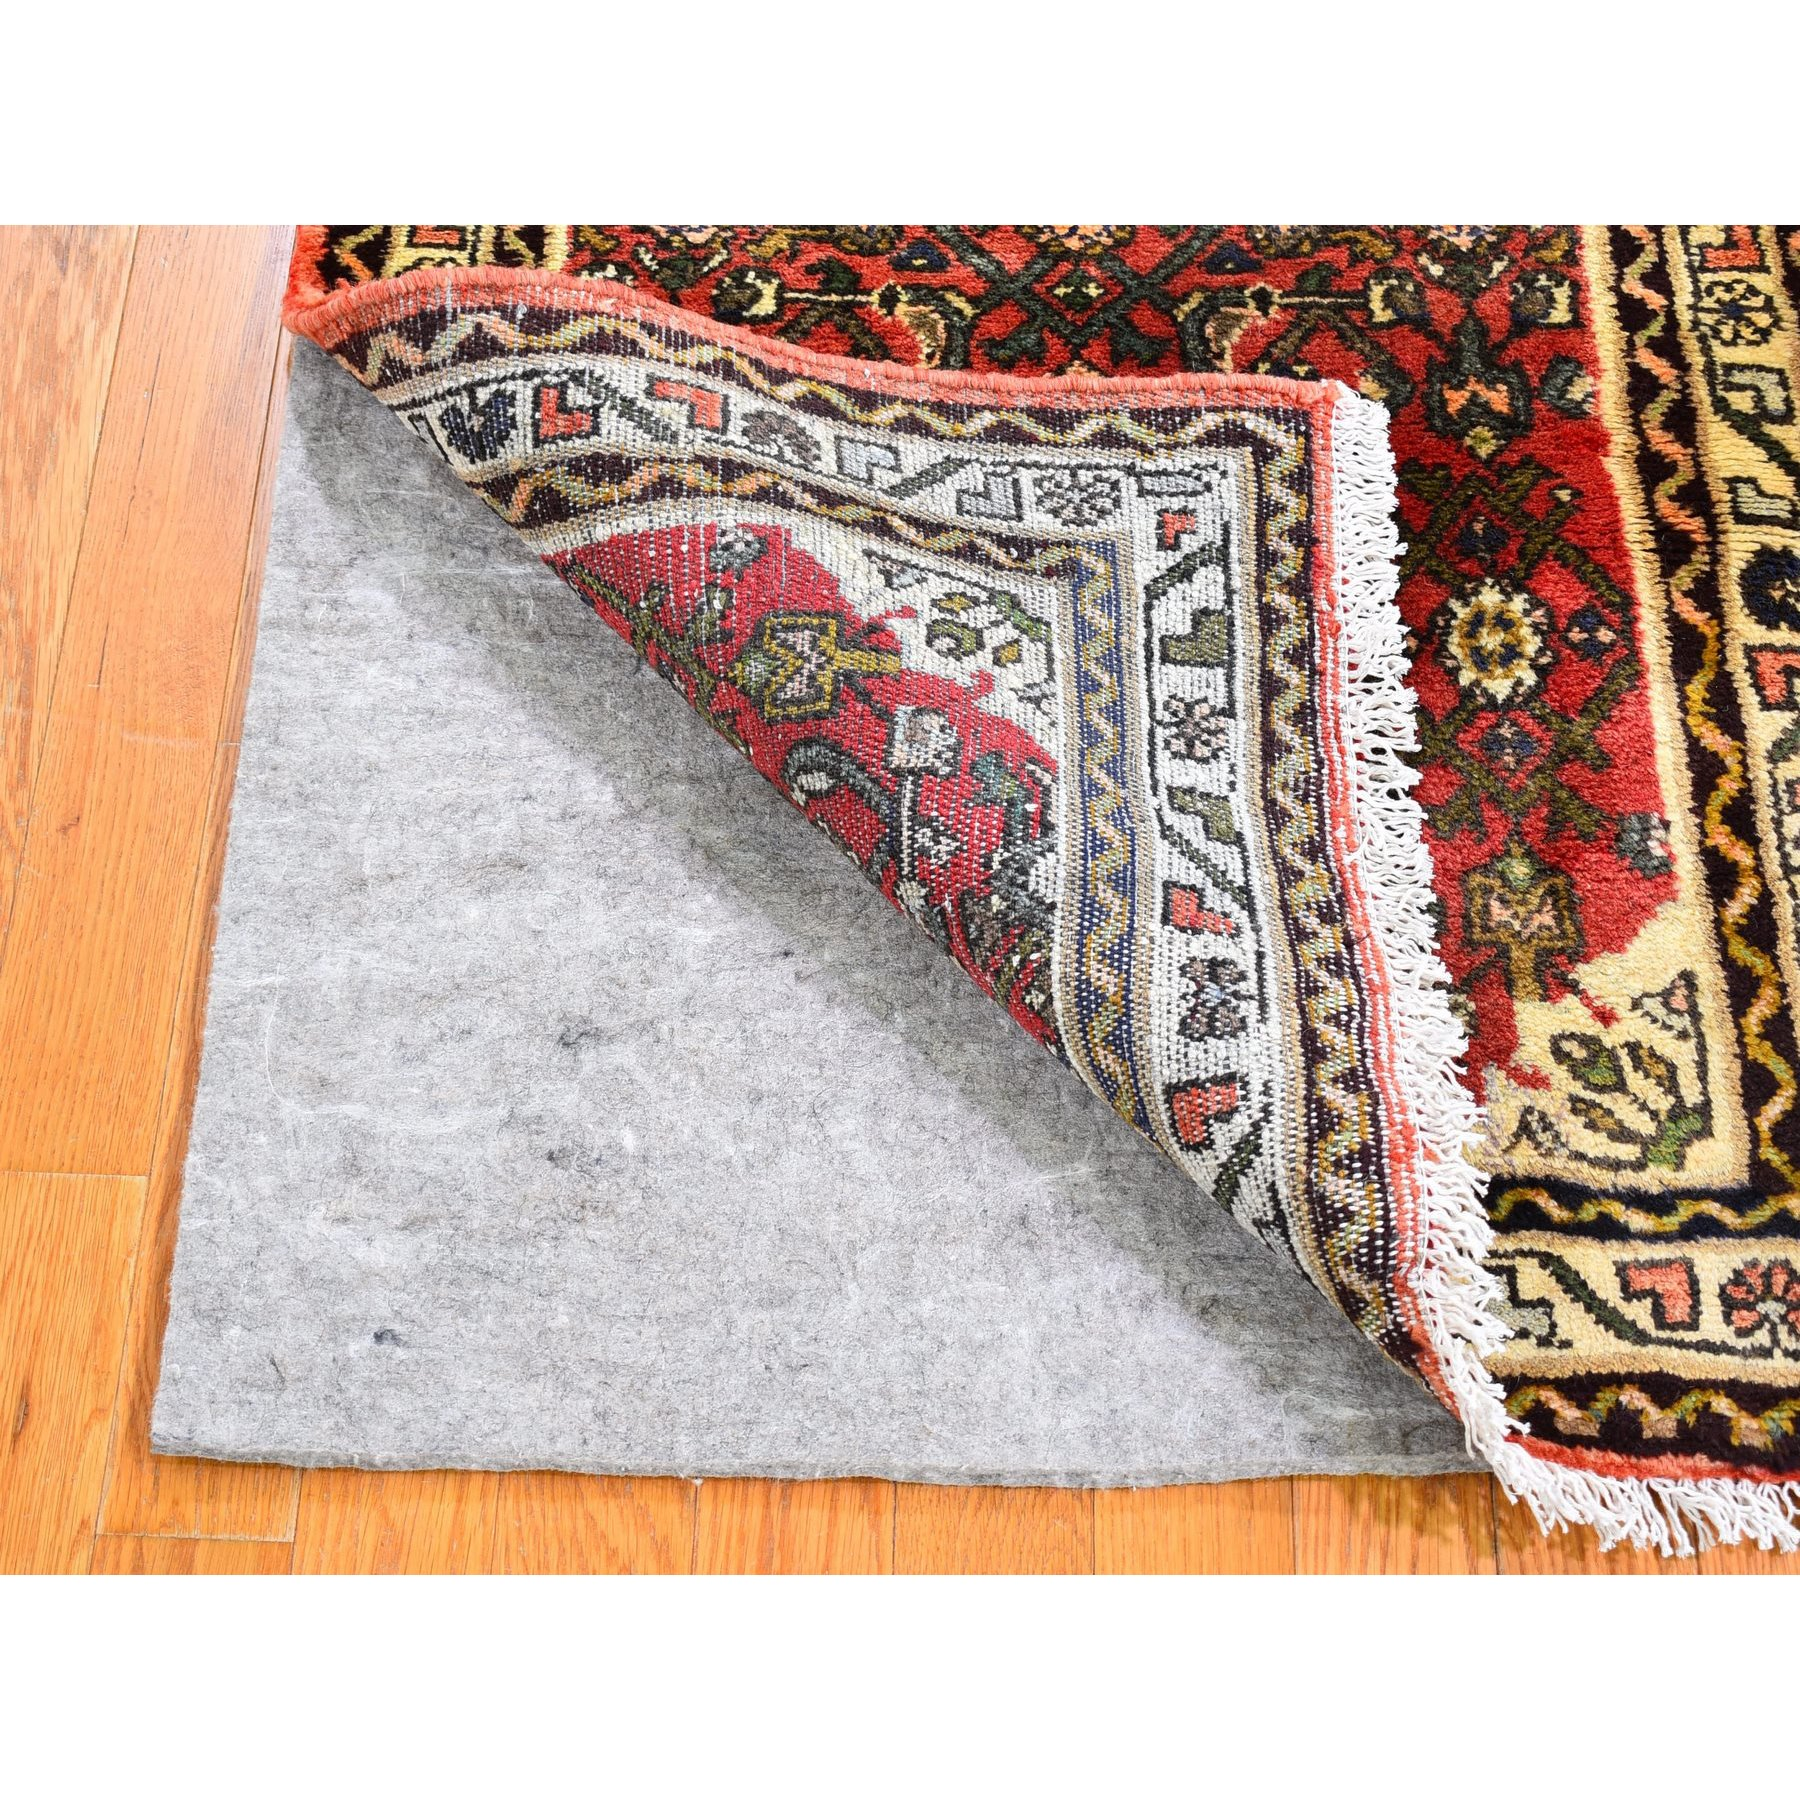 "2'8""x6'9"" Red Vintage Persian Hamadan Fish Design Short Runner Hand Knotted Organic Wool Oriental Rug"